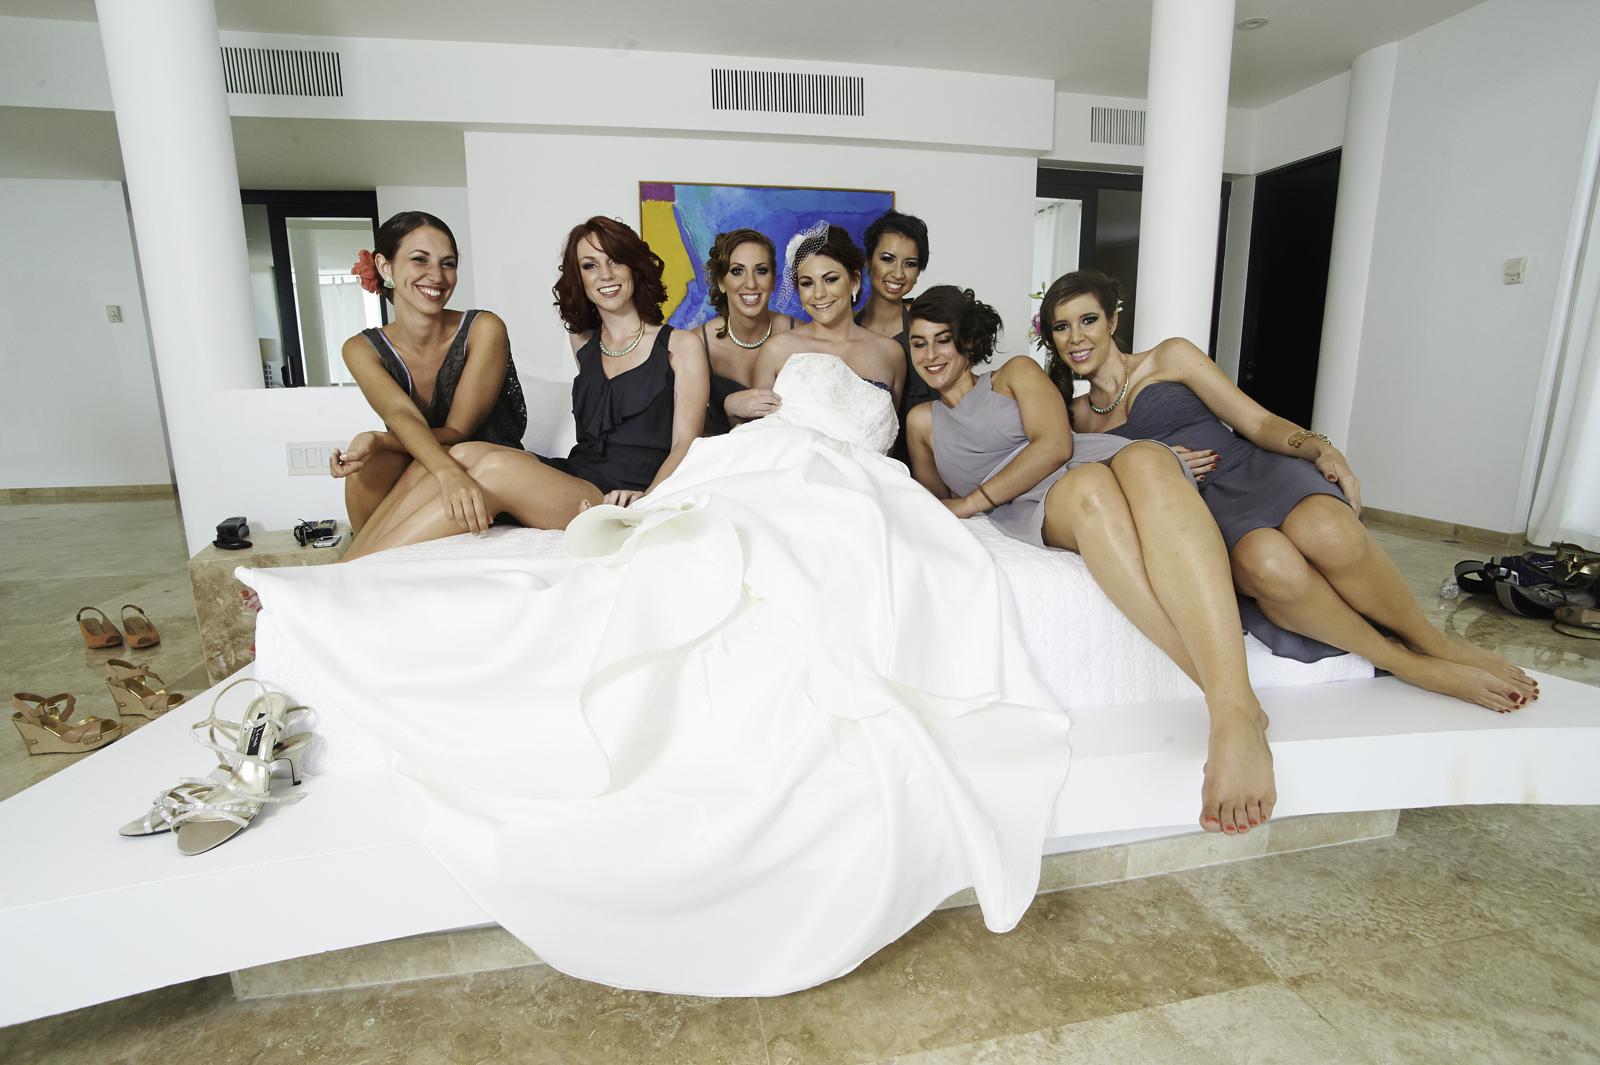 Professional wedding photographer in Punta Mita - Bride and friends